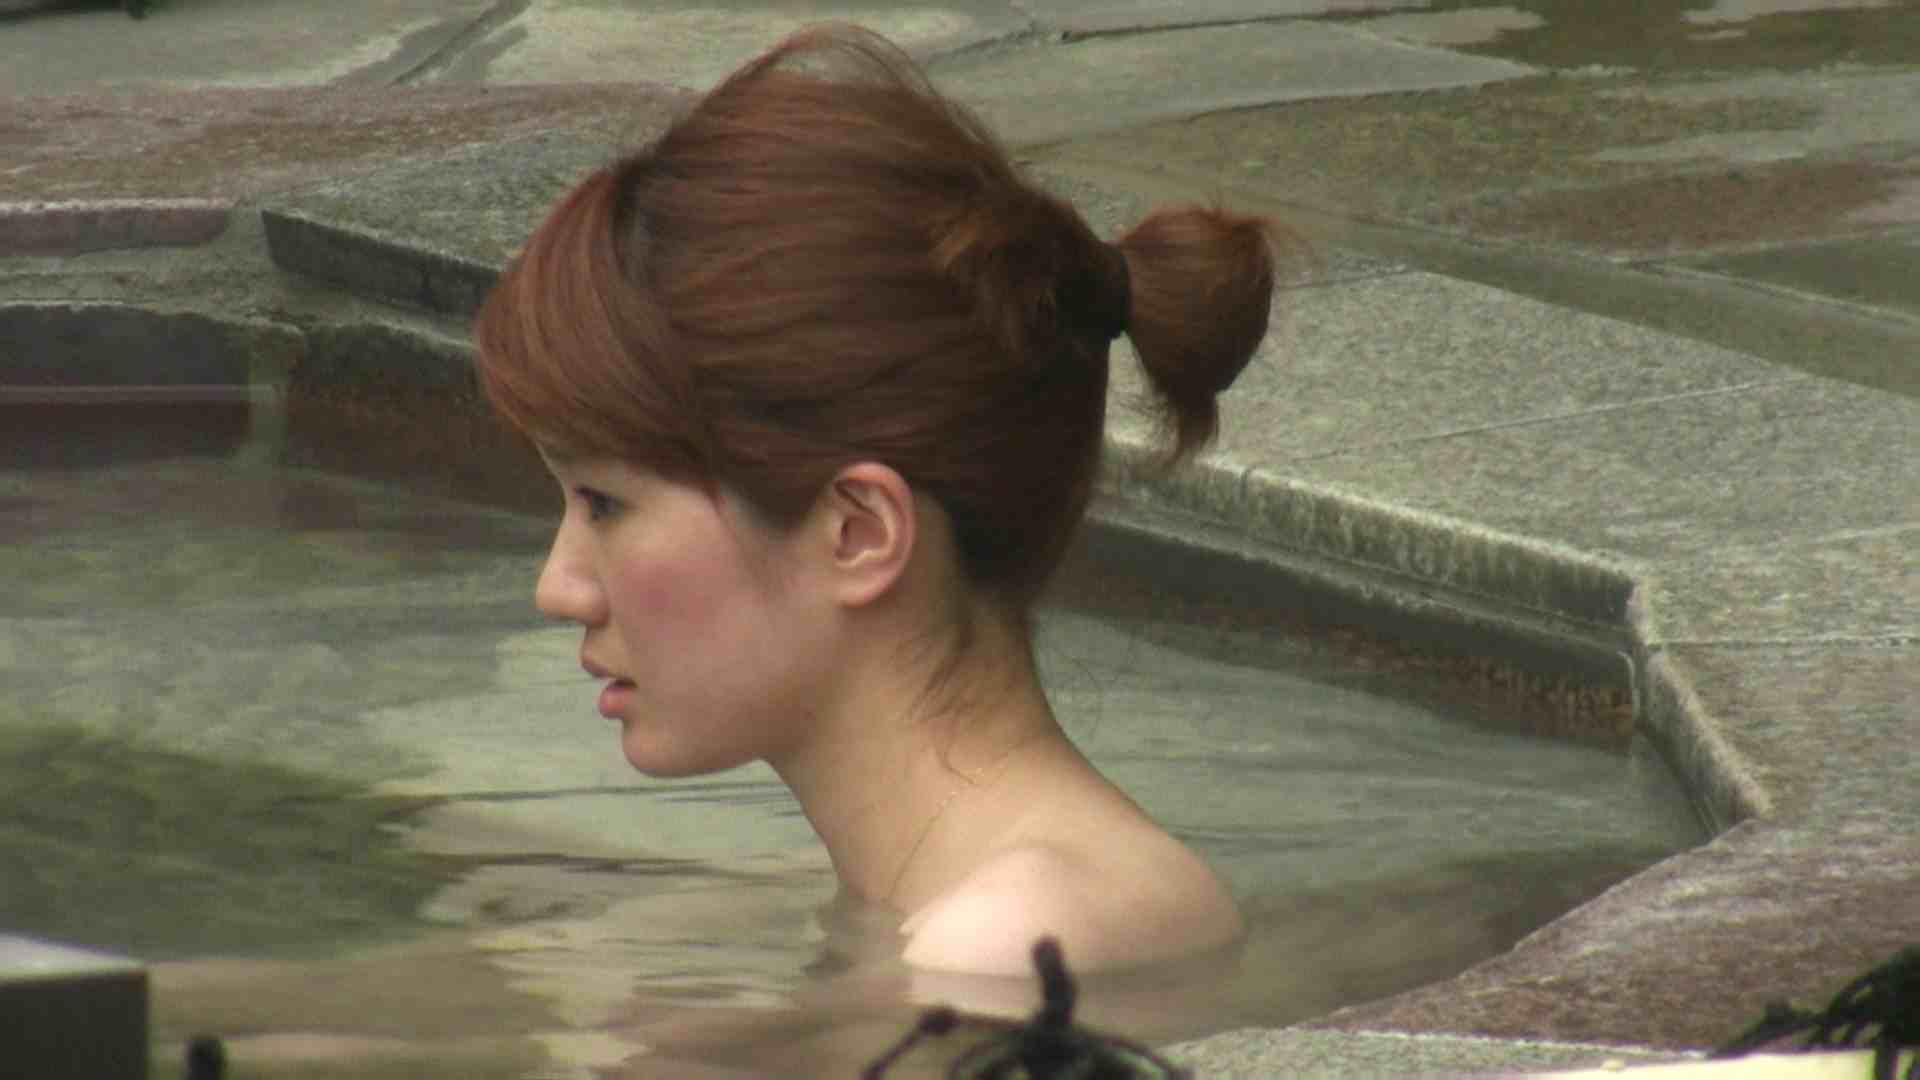 Aquaな露天風呂Vol.110 HなOL | 盗撮  71pic 28